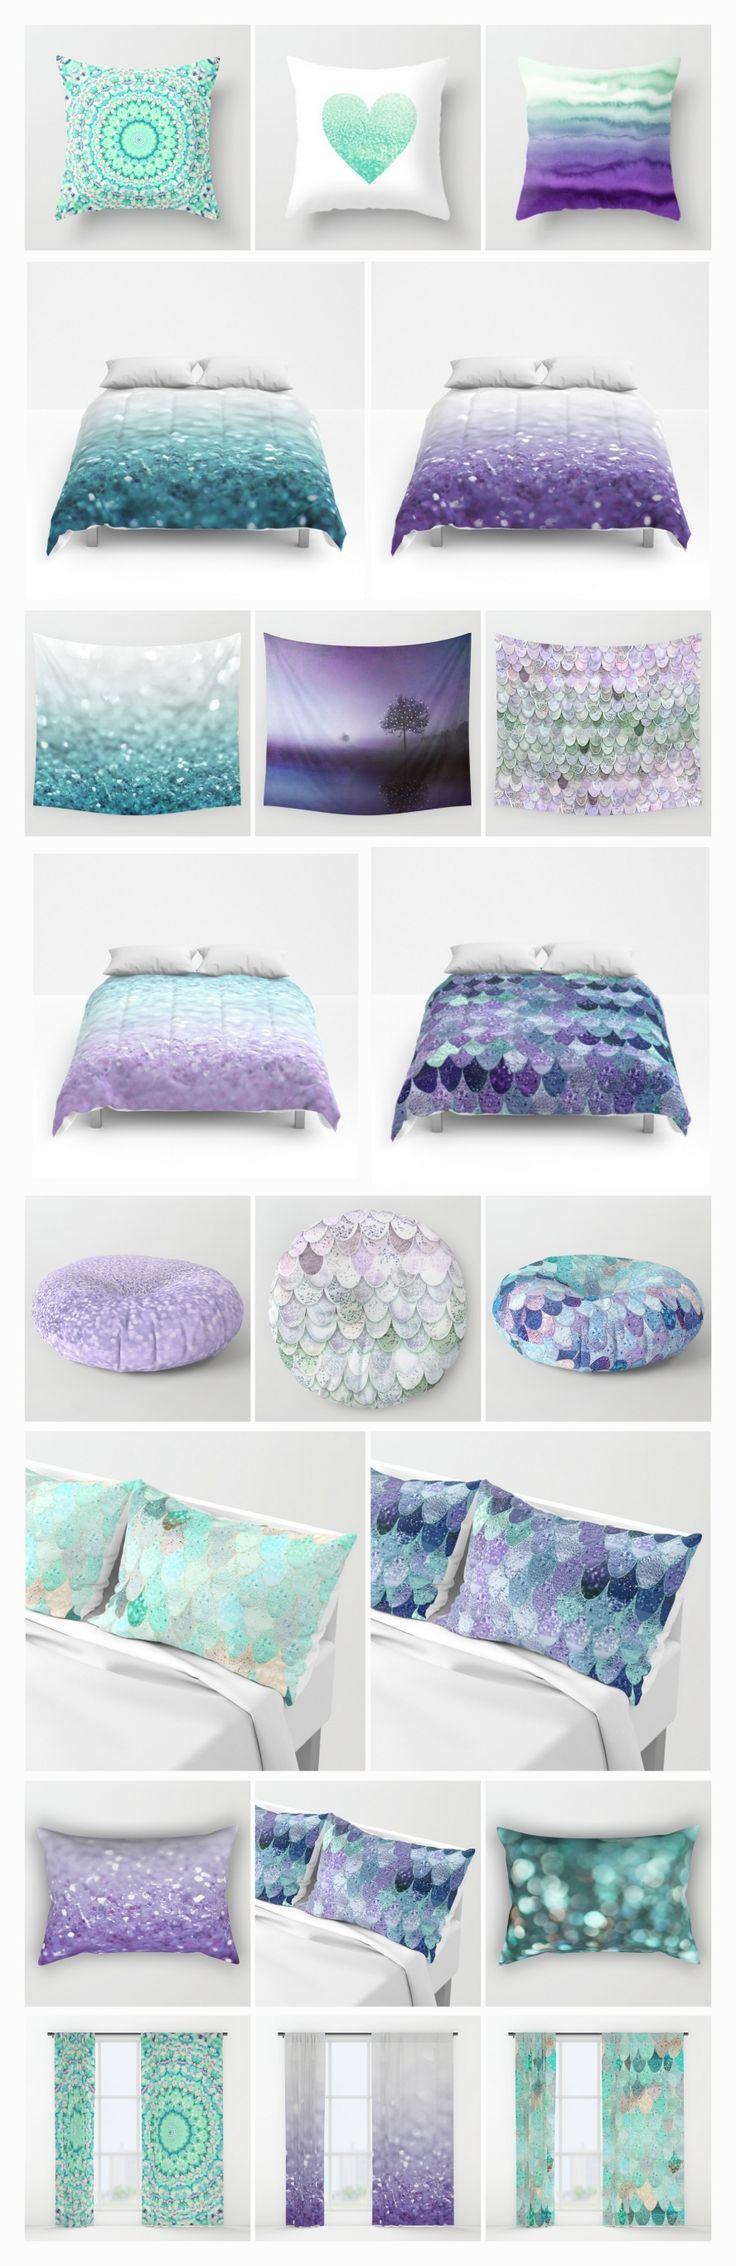 Teen vogue bedding watercolor garden - Mix Match The Cutest Teen Room In Purple And Mint Tones Glitter